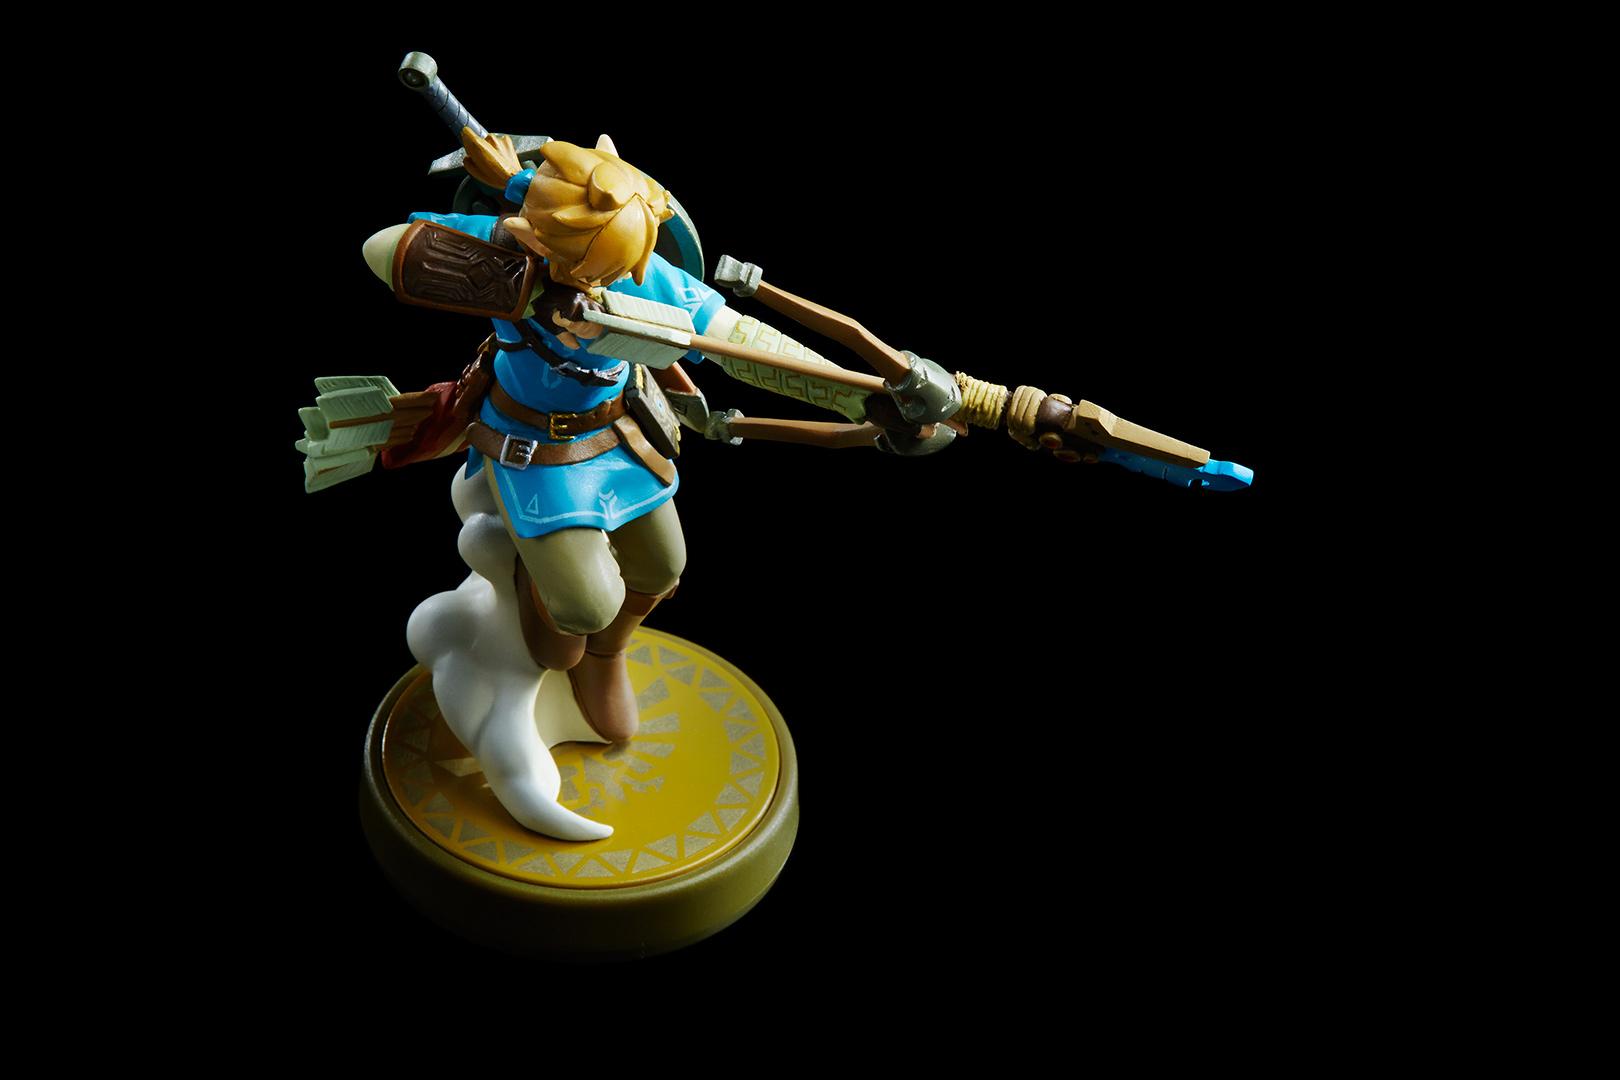 Nintendo Announces New Legend of Zelda Amiibo's; Will Launch Alongside Game